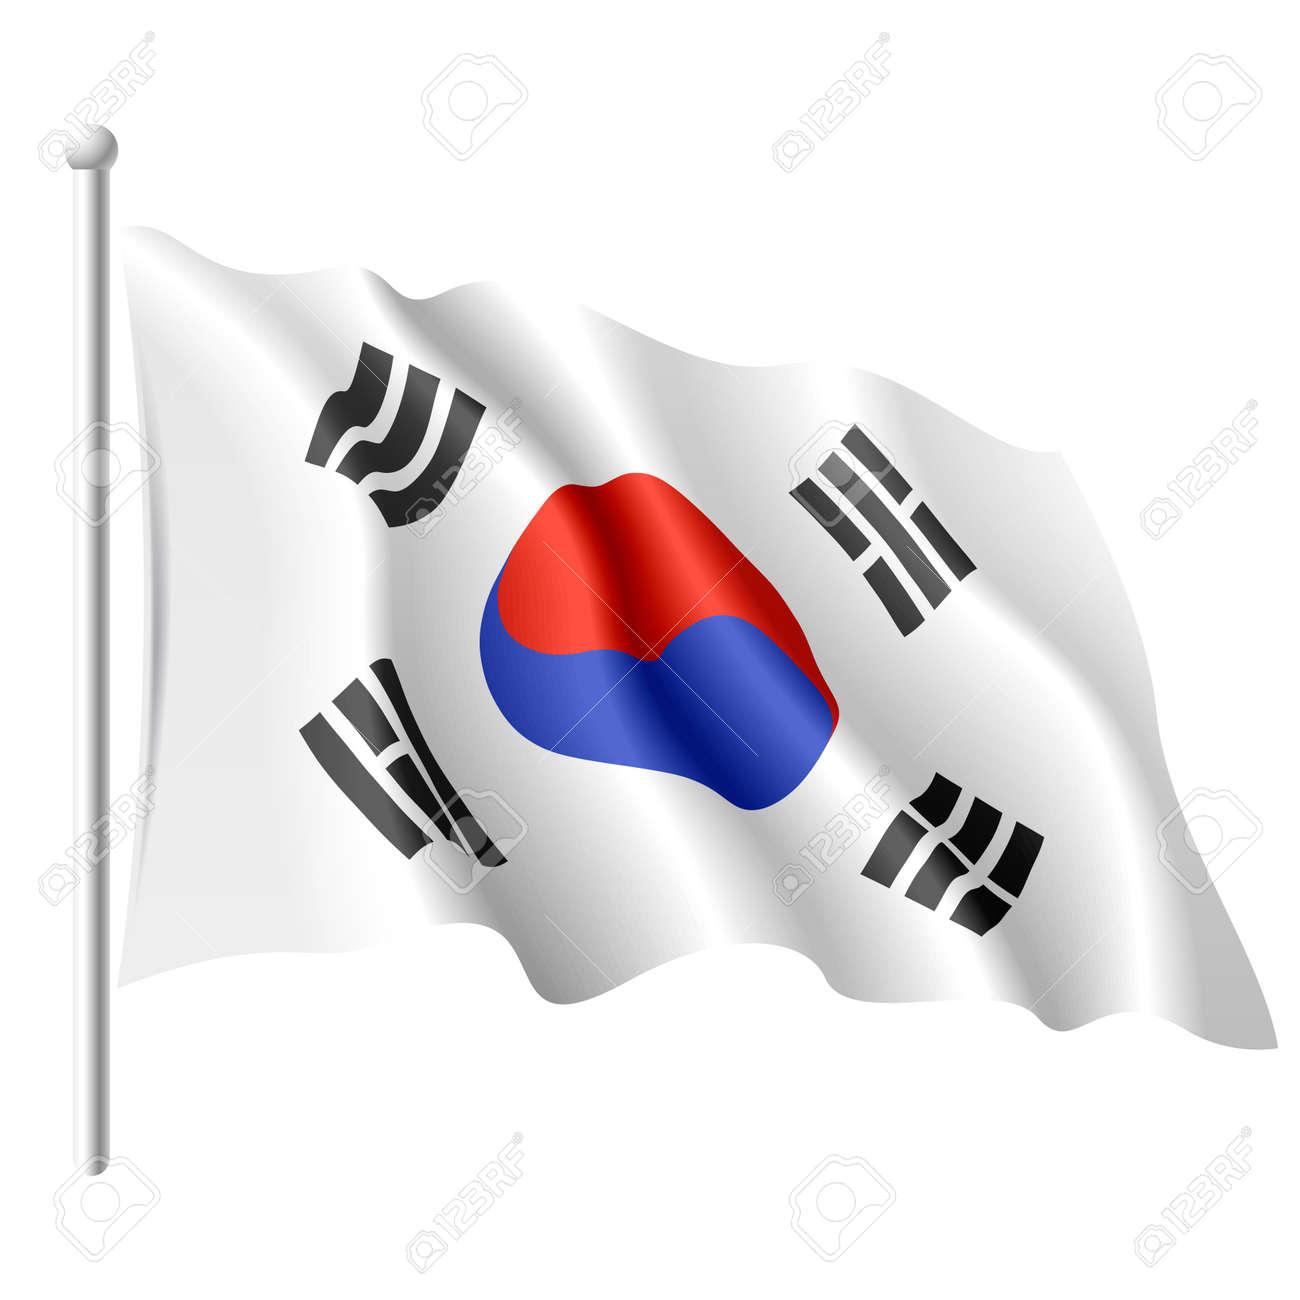 flag of south korea royalty free cliparts vectors and stock rh 123rf com korea flag vector download korean flag vector free download